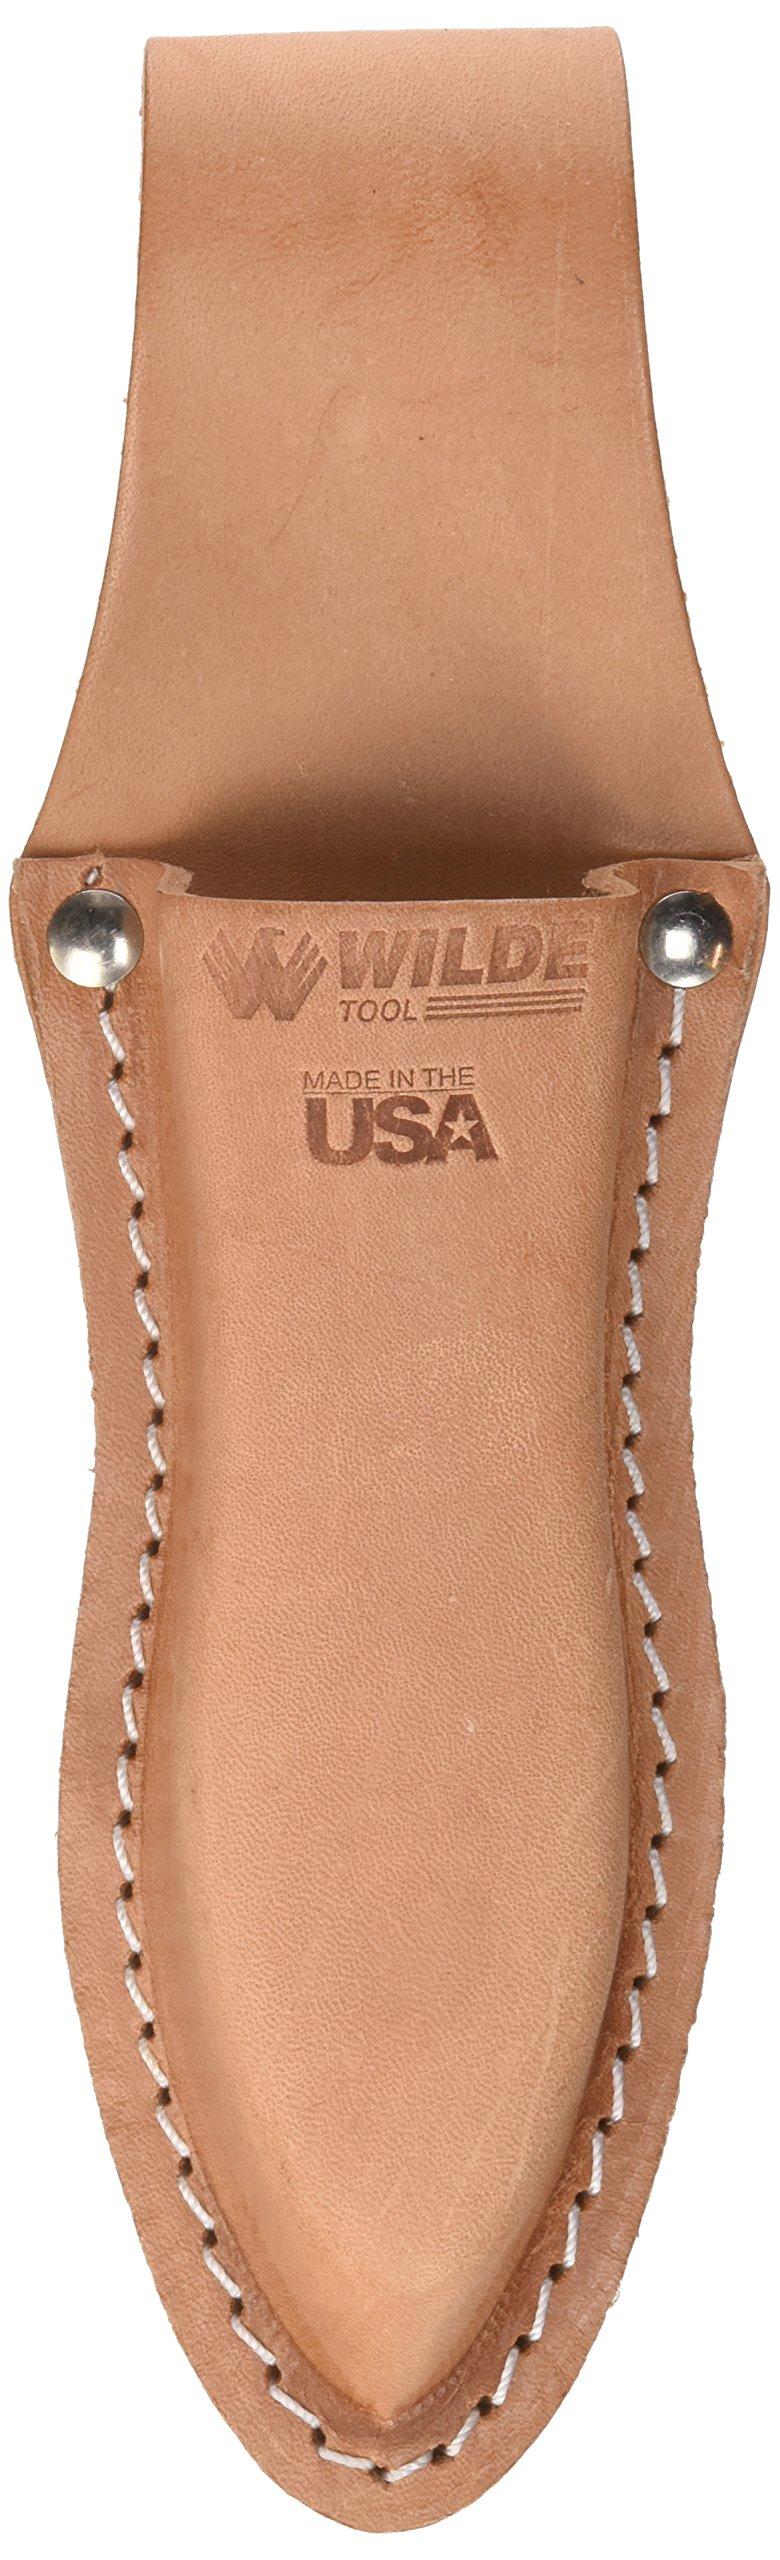 Wilde Tool A67 Double Rivet Belt Pouch for Pliers